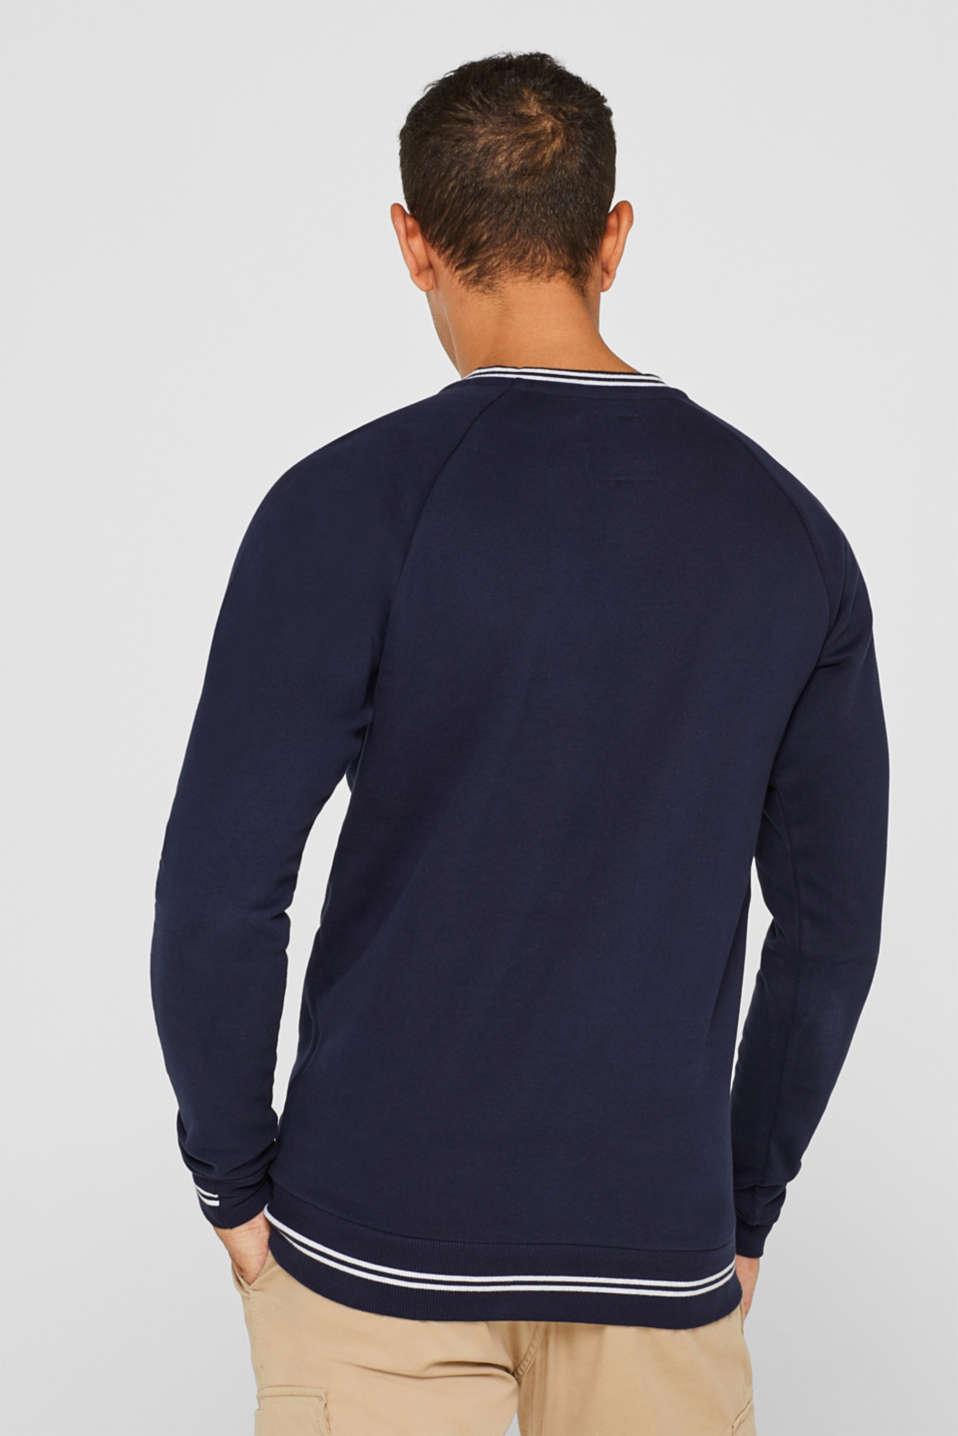 Sweatshirt in 100% cotton, NAVY, detail image number 3